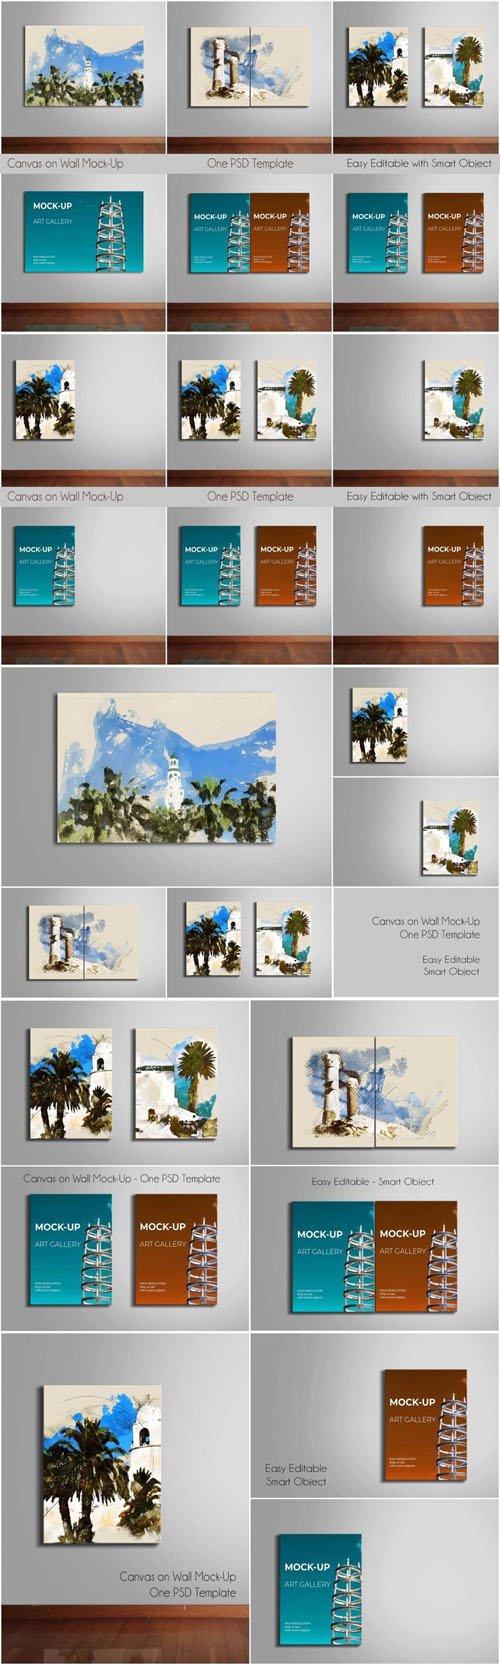 Canvas on Wall PSD Mockup Templates